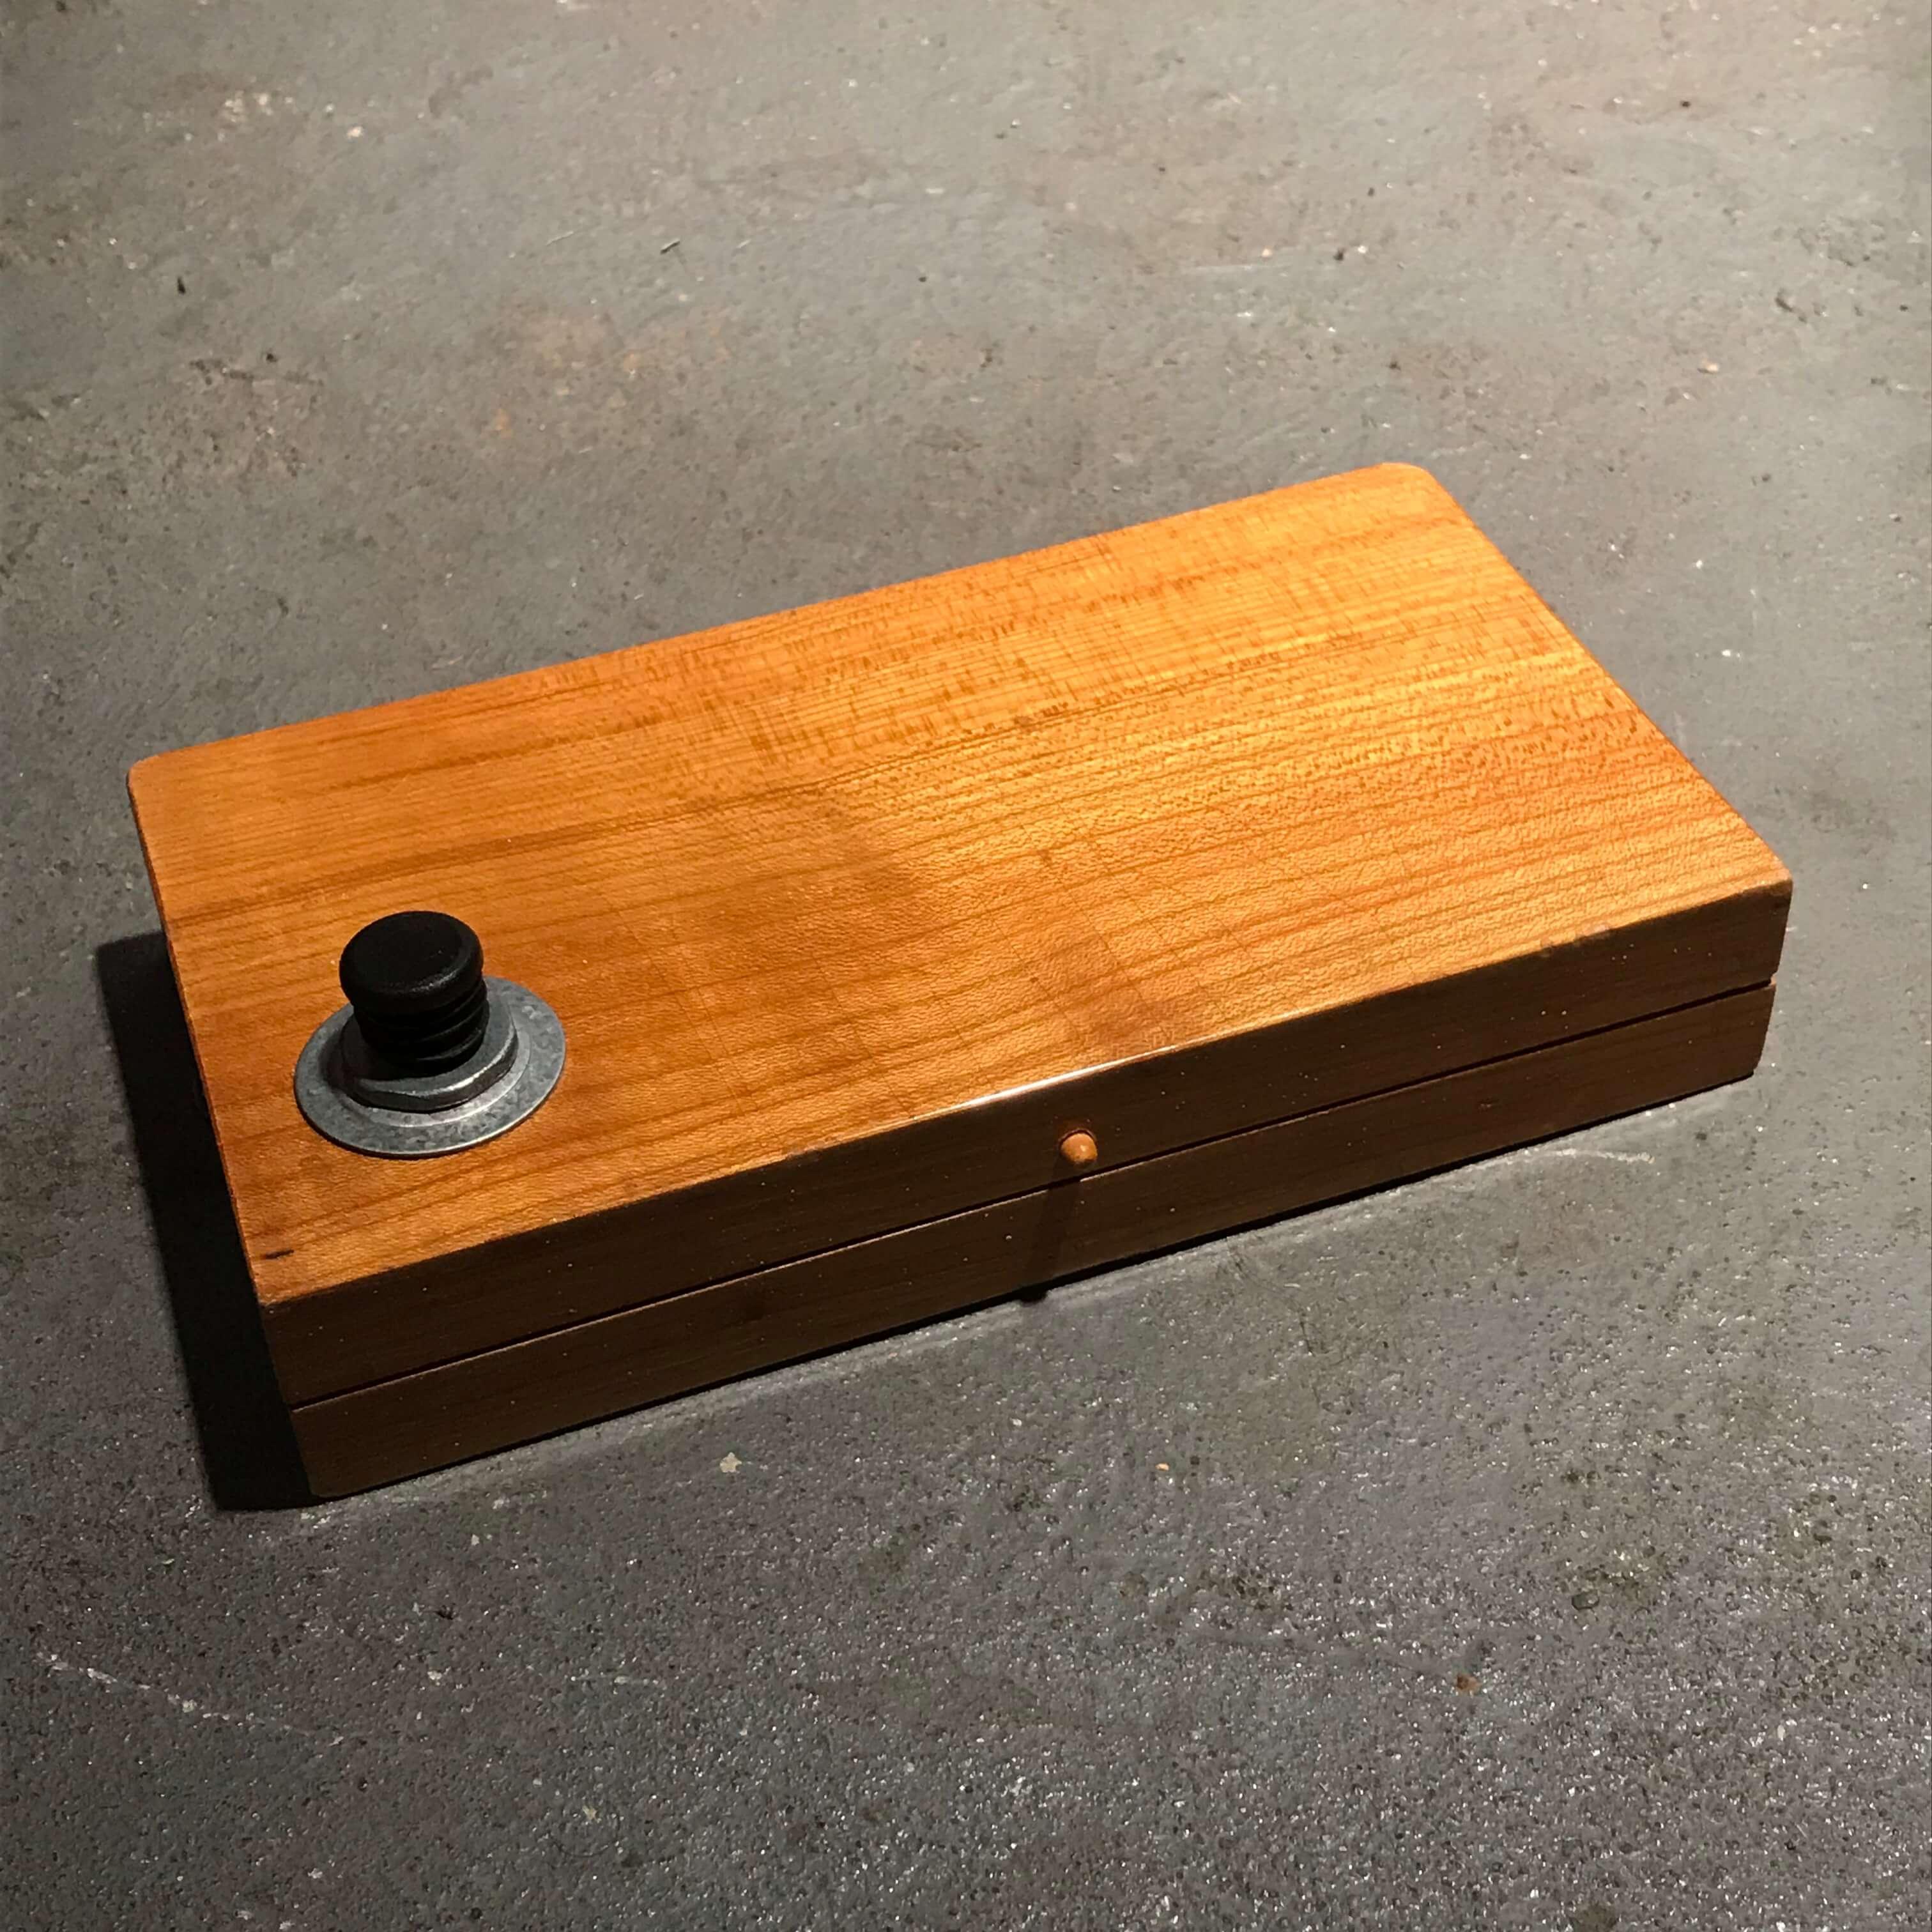 wood-box-socket-case-5